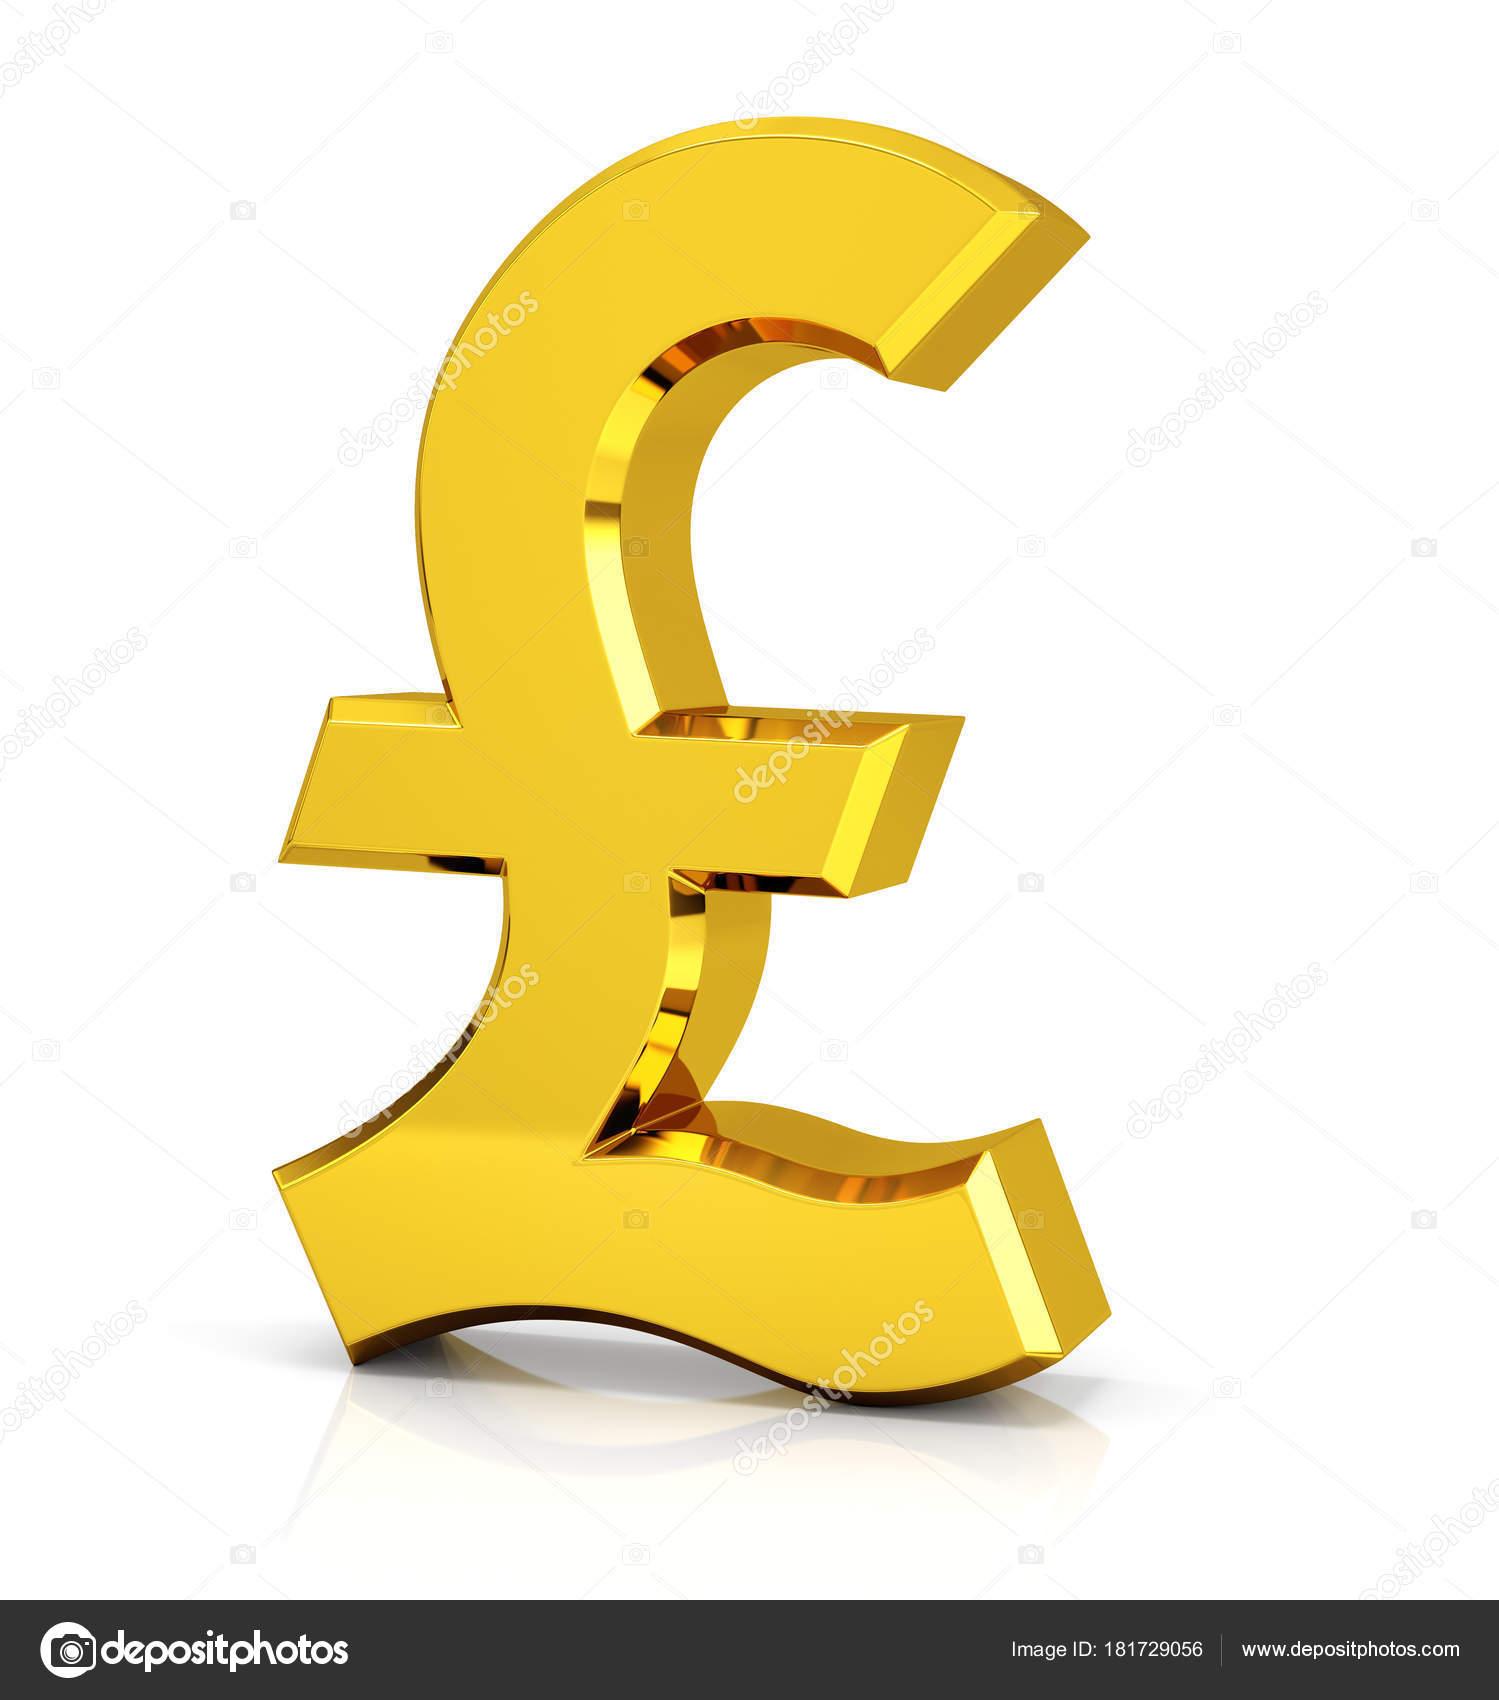 British Pound Sign Symbol Stock Photo Md3d 181729056